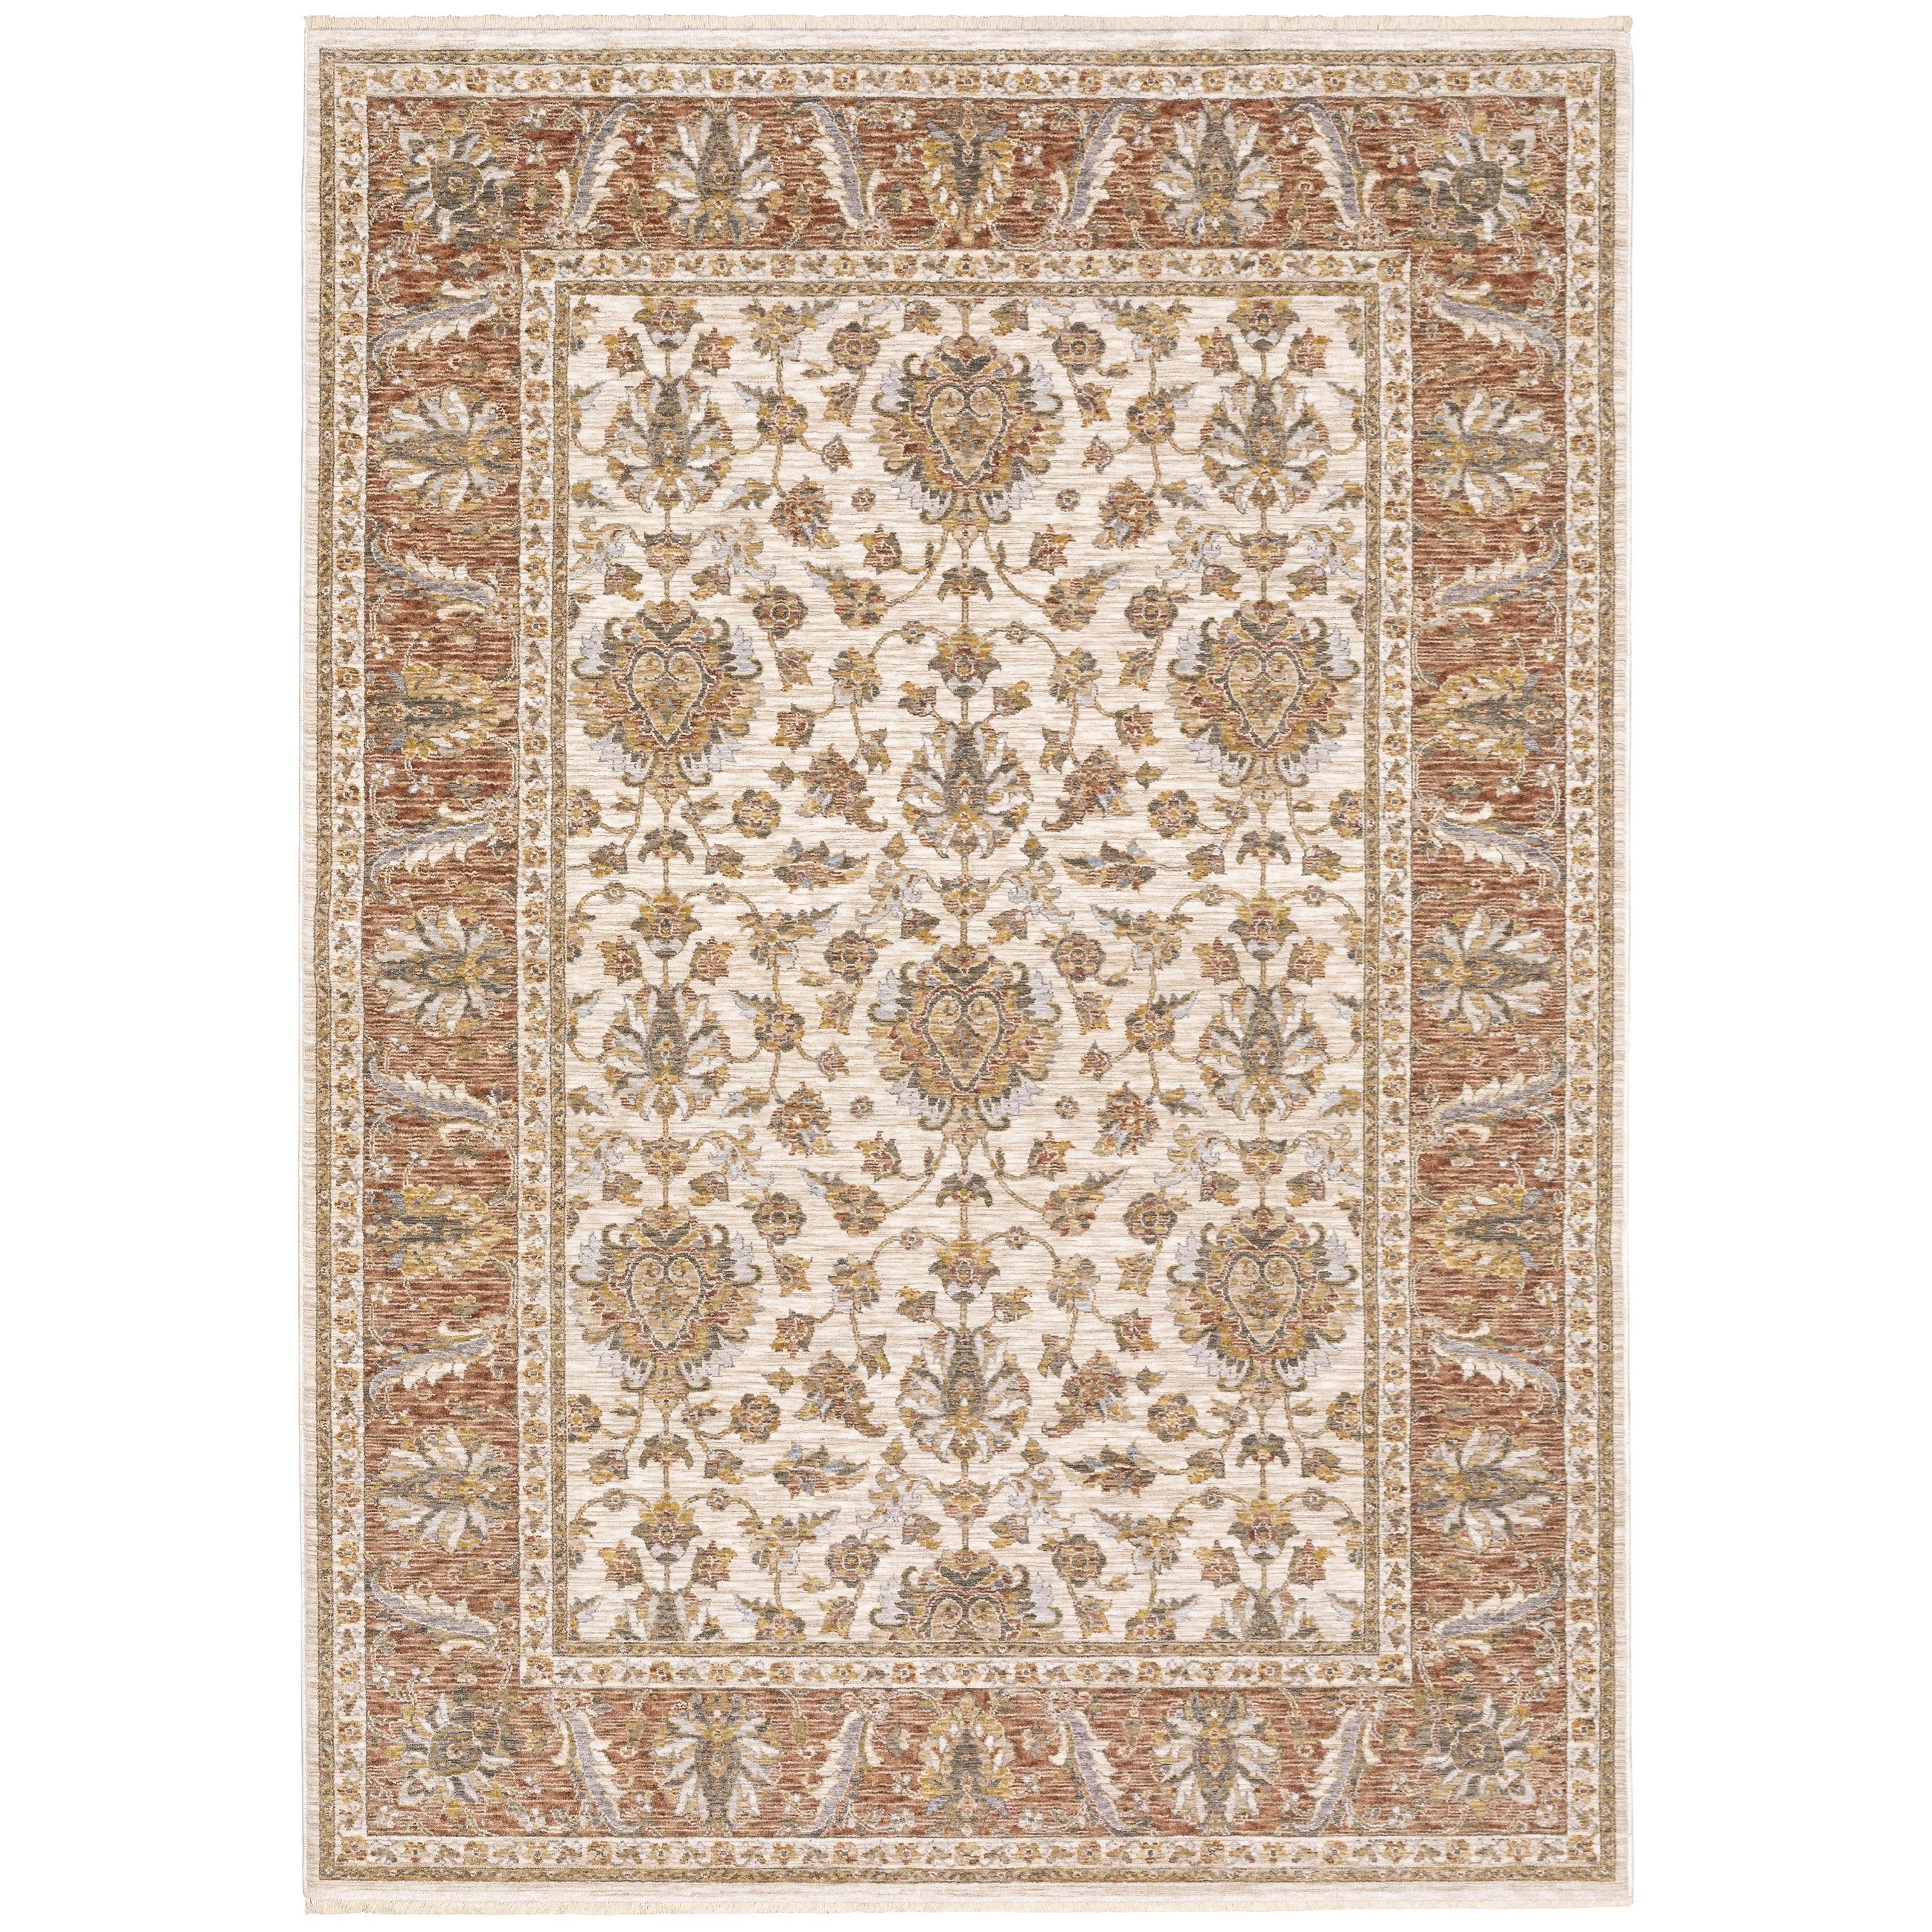 "Maharaja 6' 7"" X  9' 6"" Rectangle Rug by Oriental Weavers at Novello Home Furnishings"